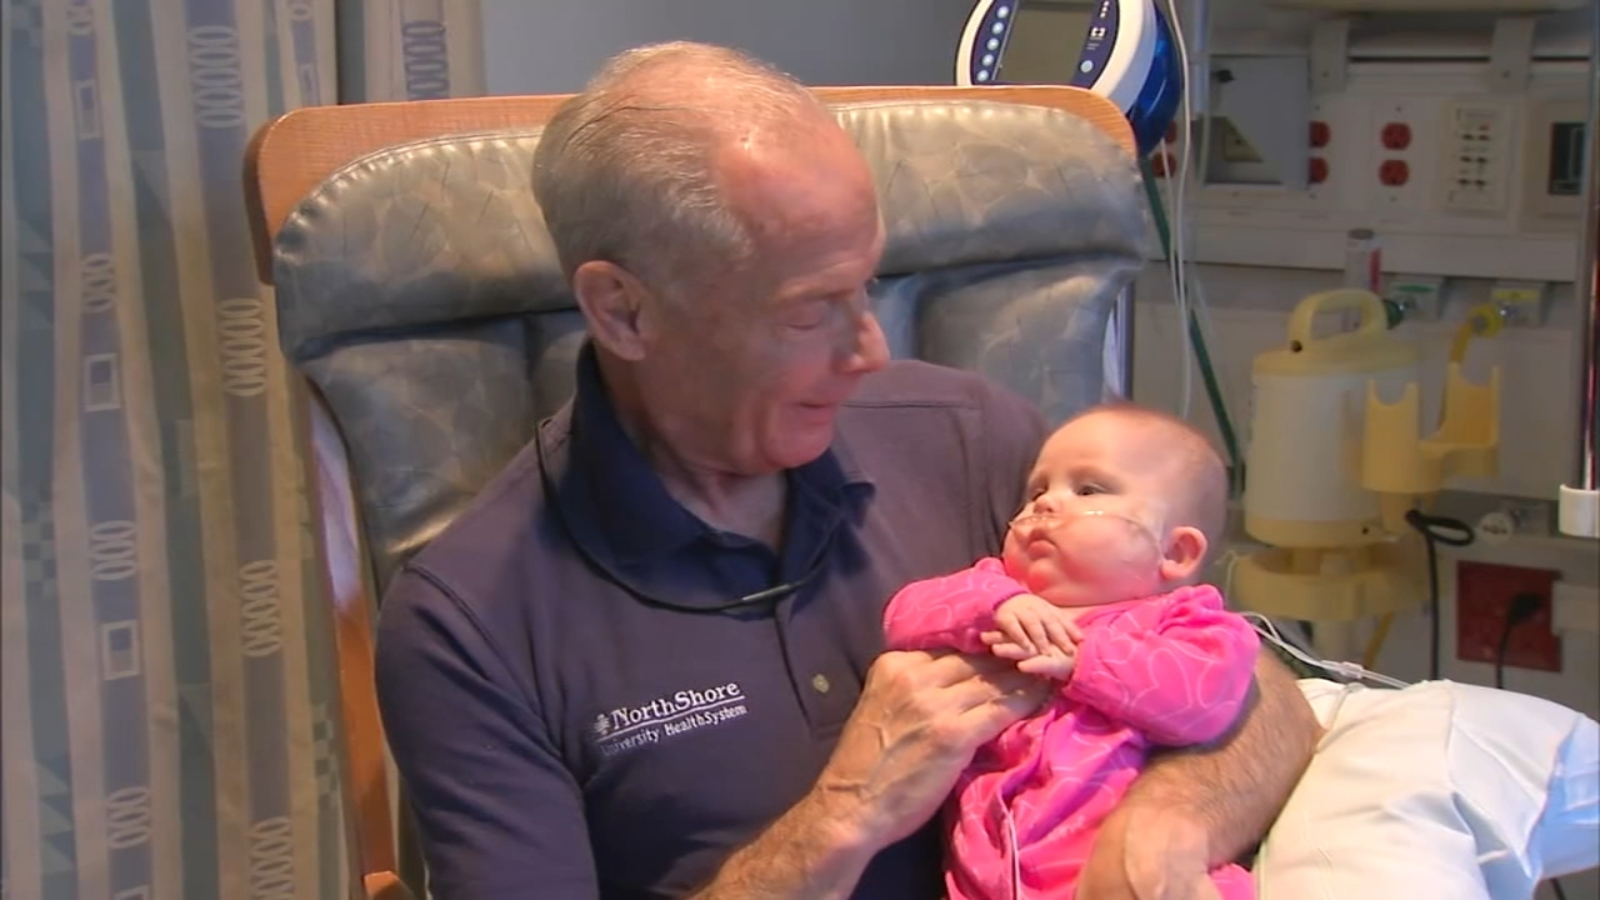 Evanston Hospital Welcomes First Male Baby Cuddler